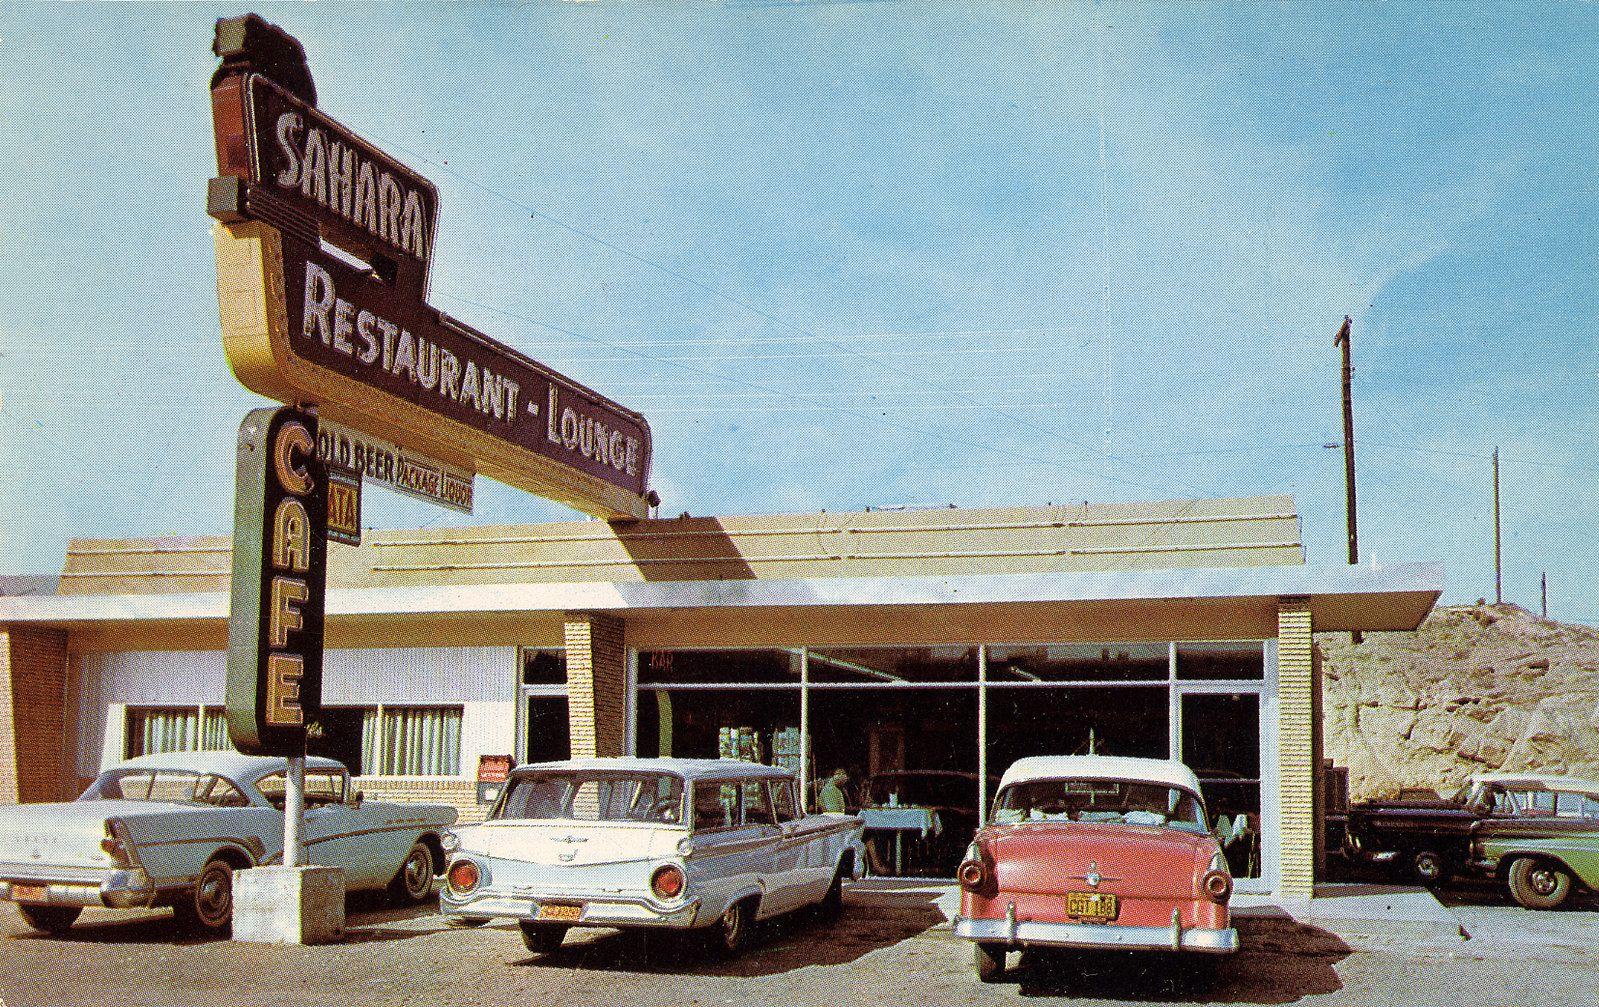 Sahara Cafe Restaurant And Lounge